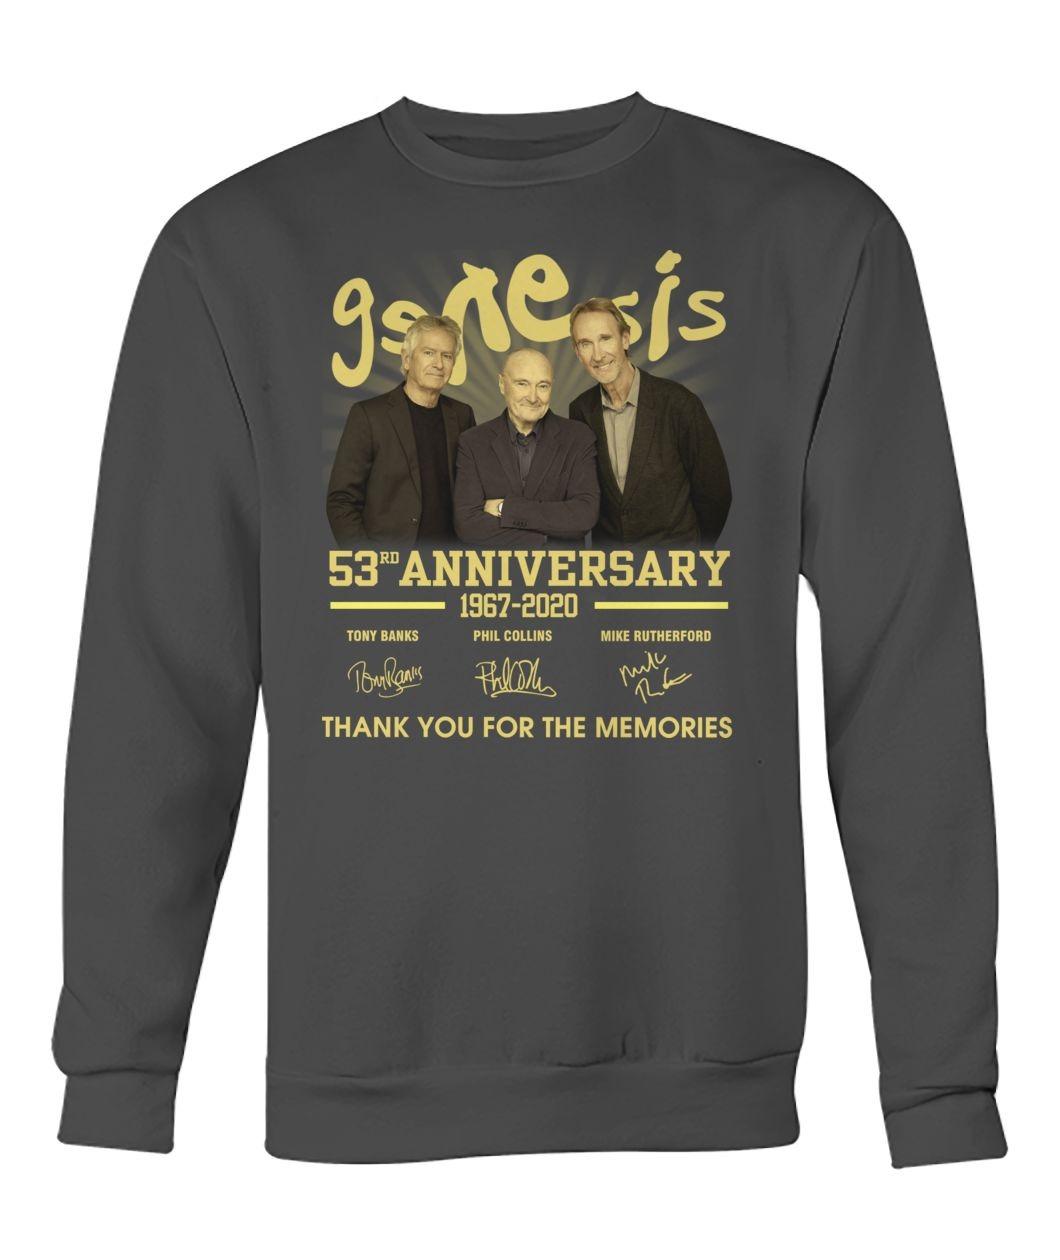 Genesis 53rd anniversary Thank you for the memories Sweatshirt